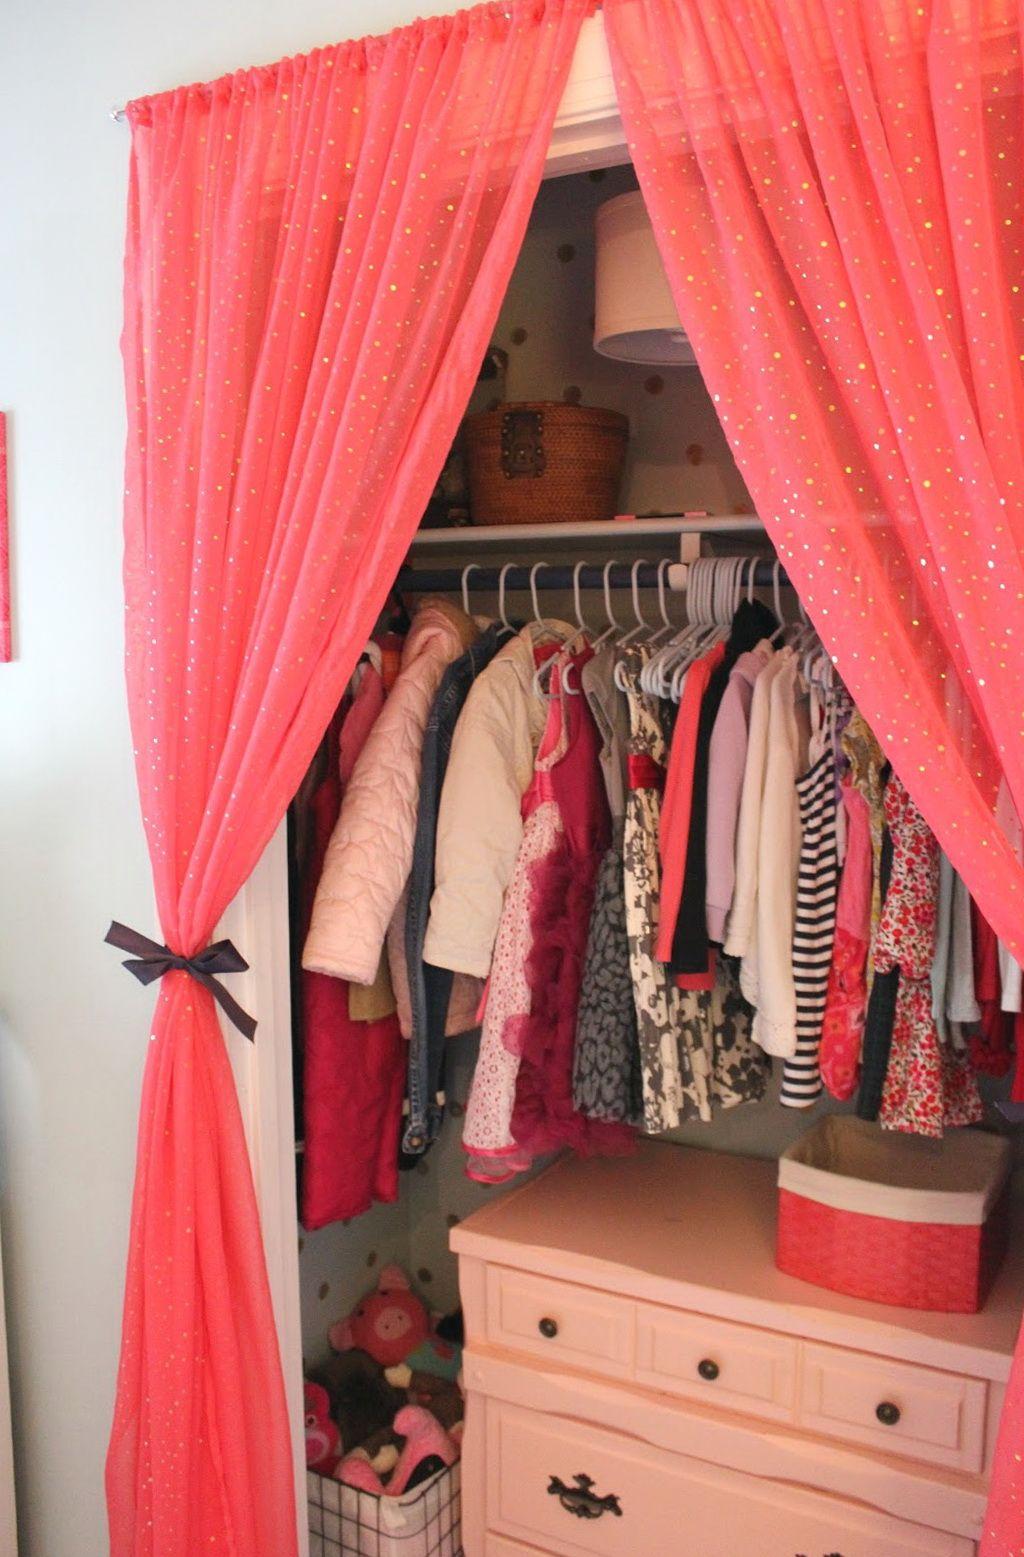 Best Closet Door Ideas To Spruce Up Your Room Curtains For Closet Doors Closet Door Alternative Diy Closet Doors